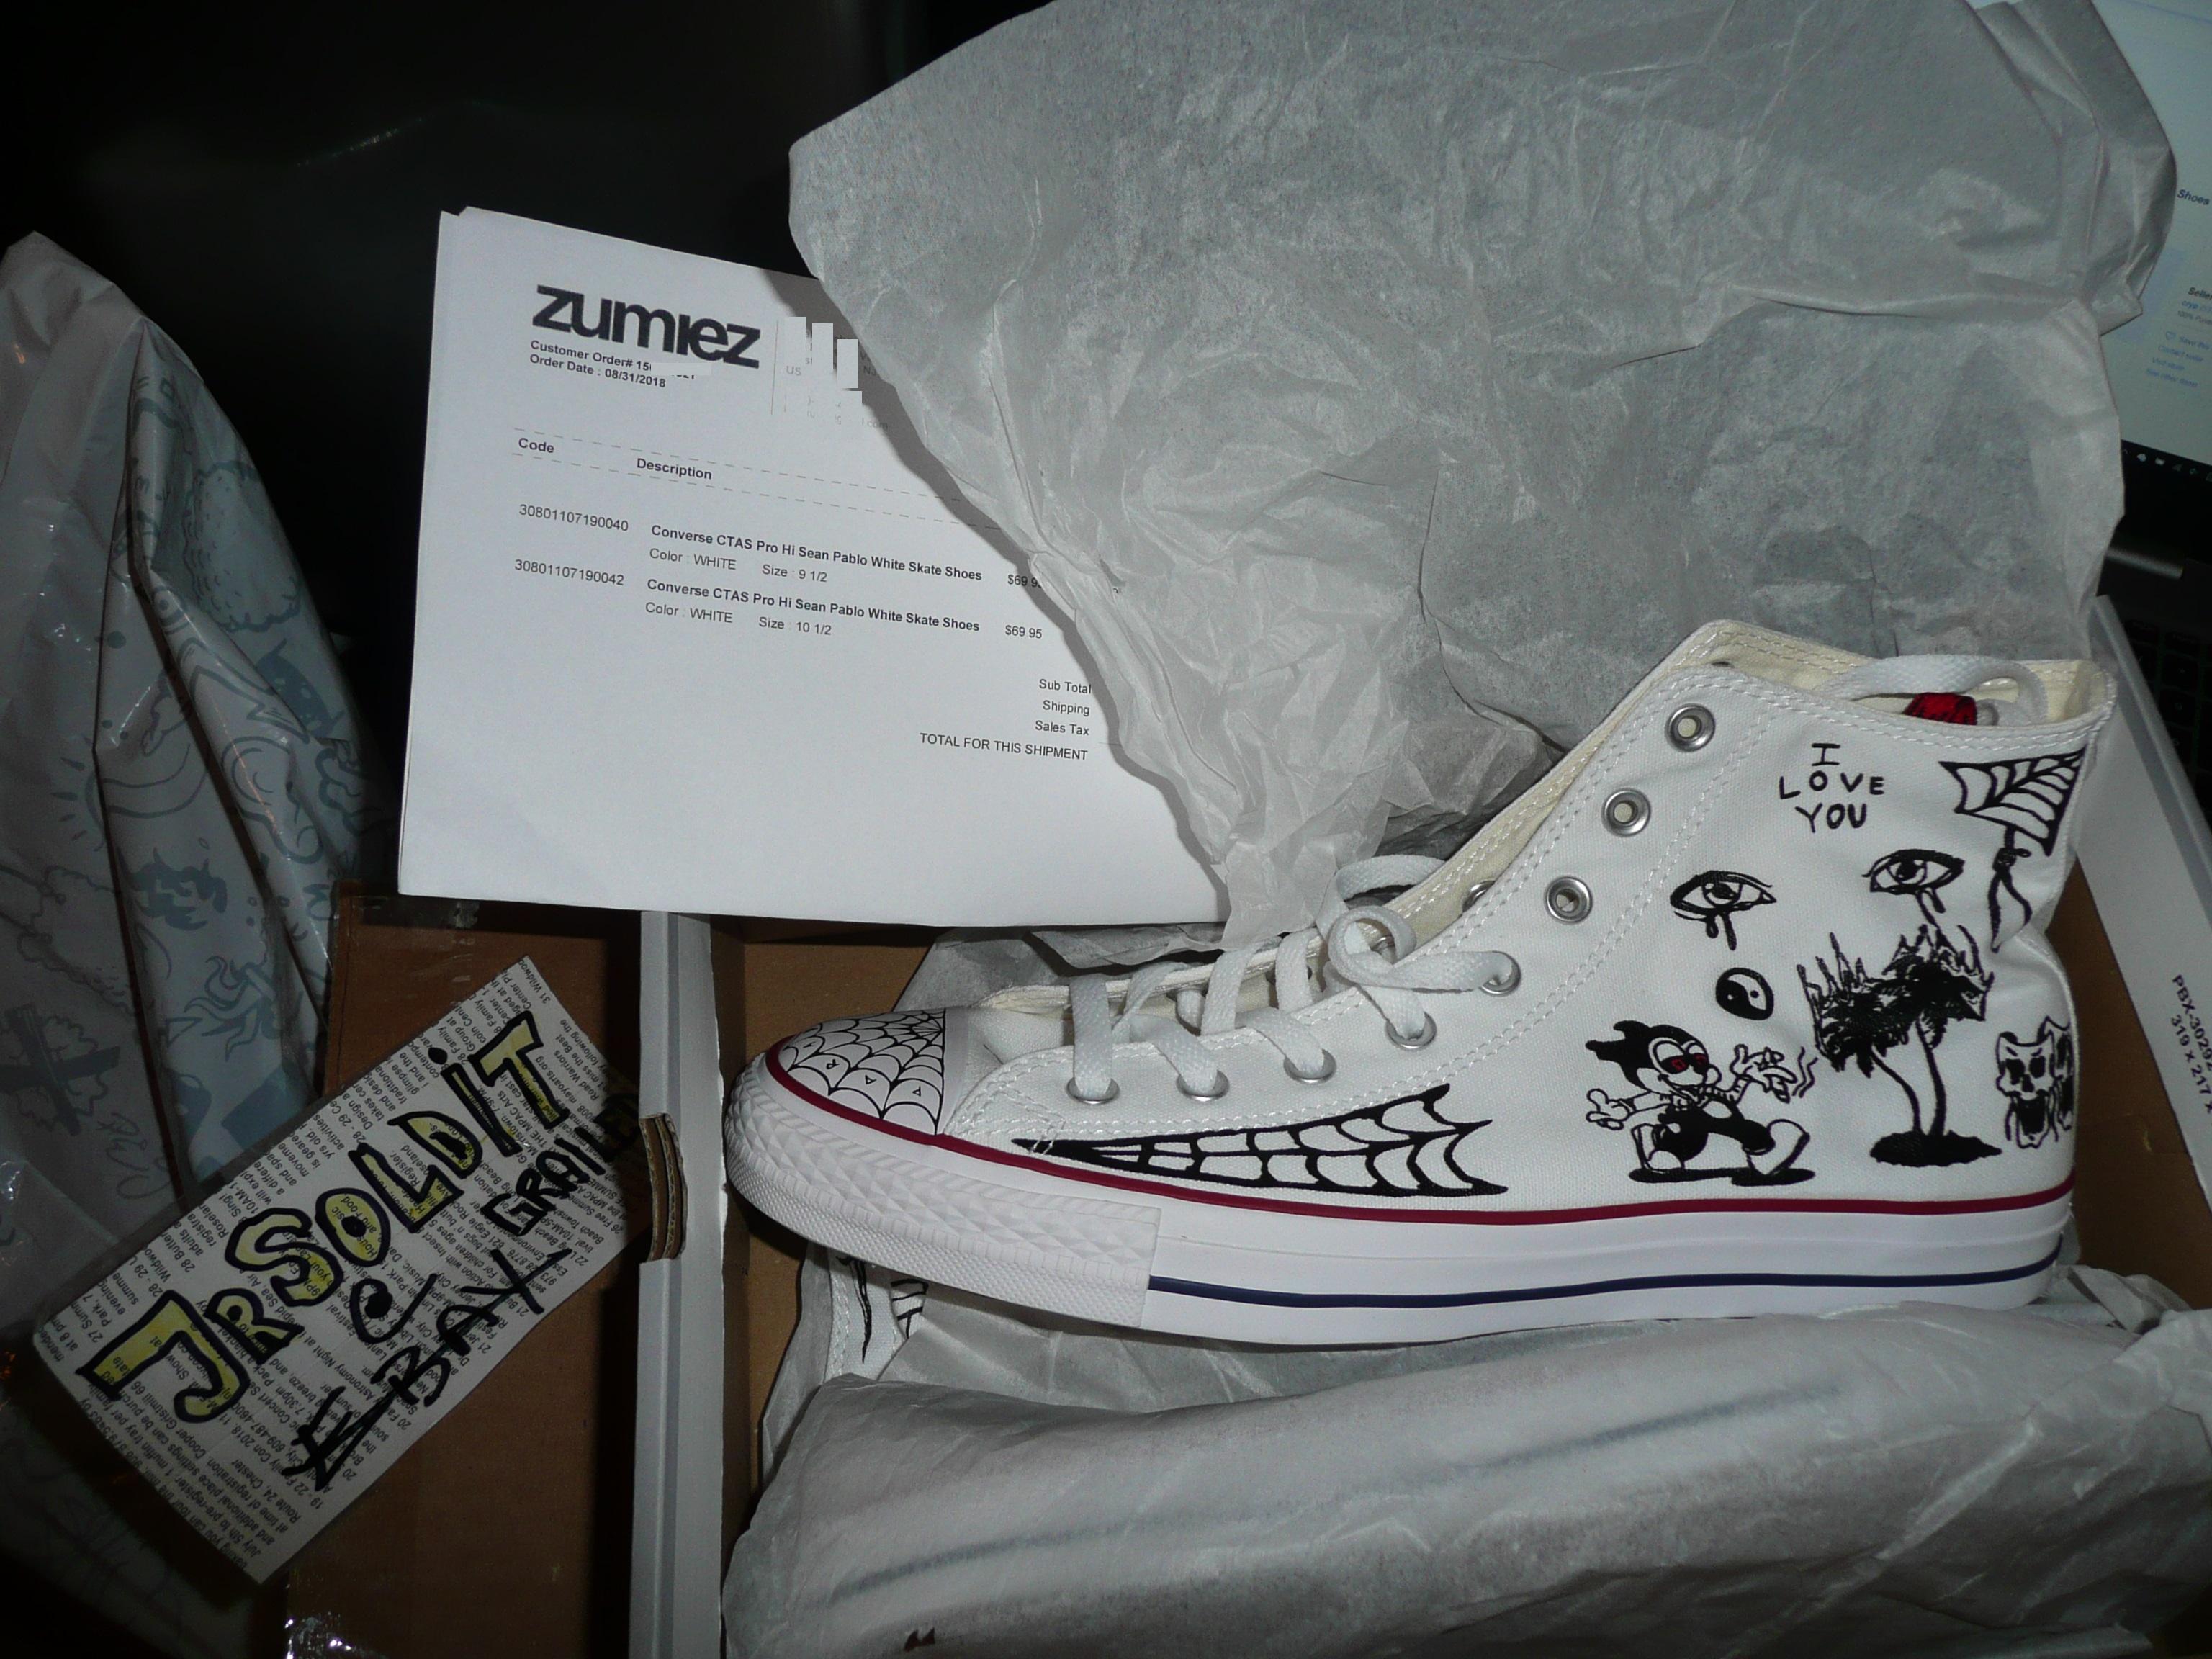 Converse Converse X Sean Pablo CTAS Pro High Top WHITE Chuck Taylor Size M  10.5   W 12.5 DS  2018  Size 10.5 - Hi-Top Sneakers for Sale - Grailed d2282bb5f